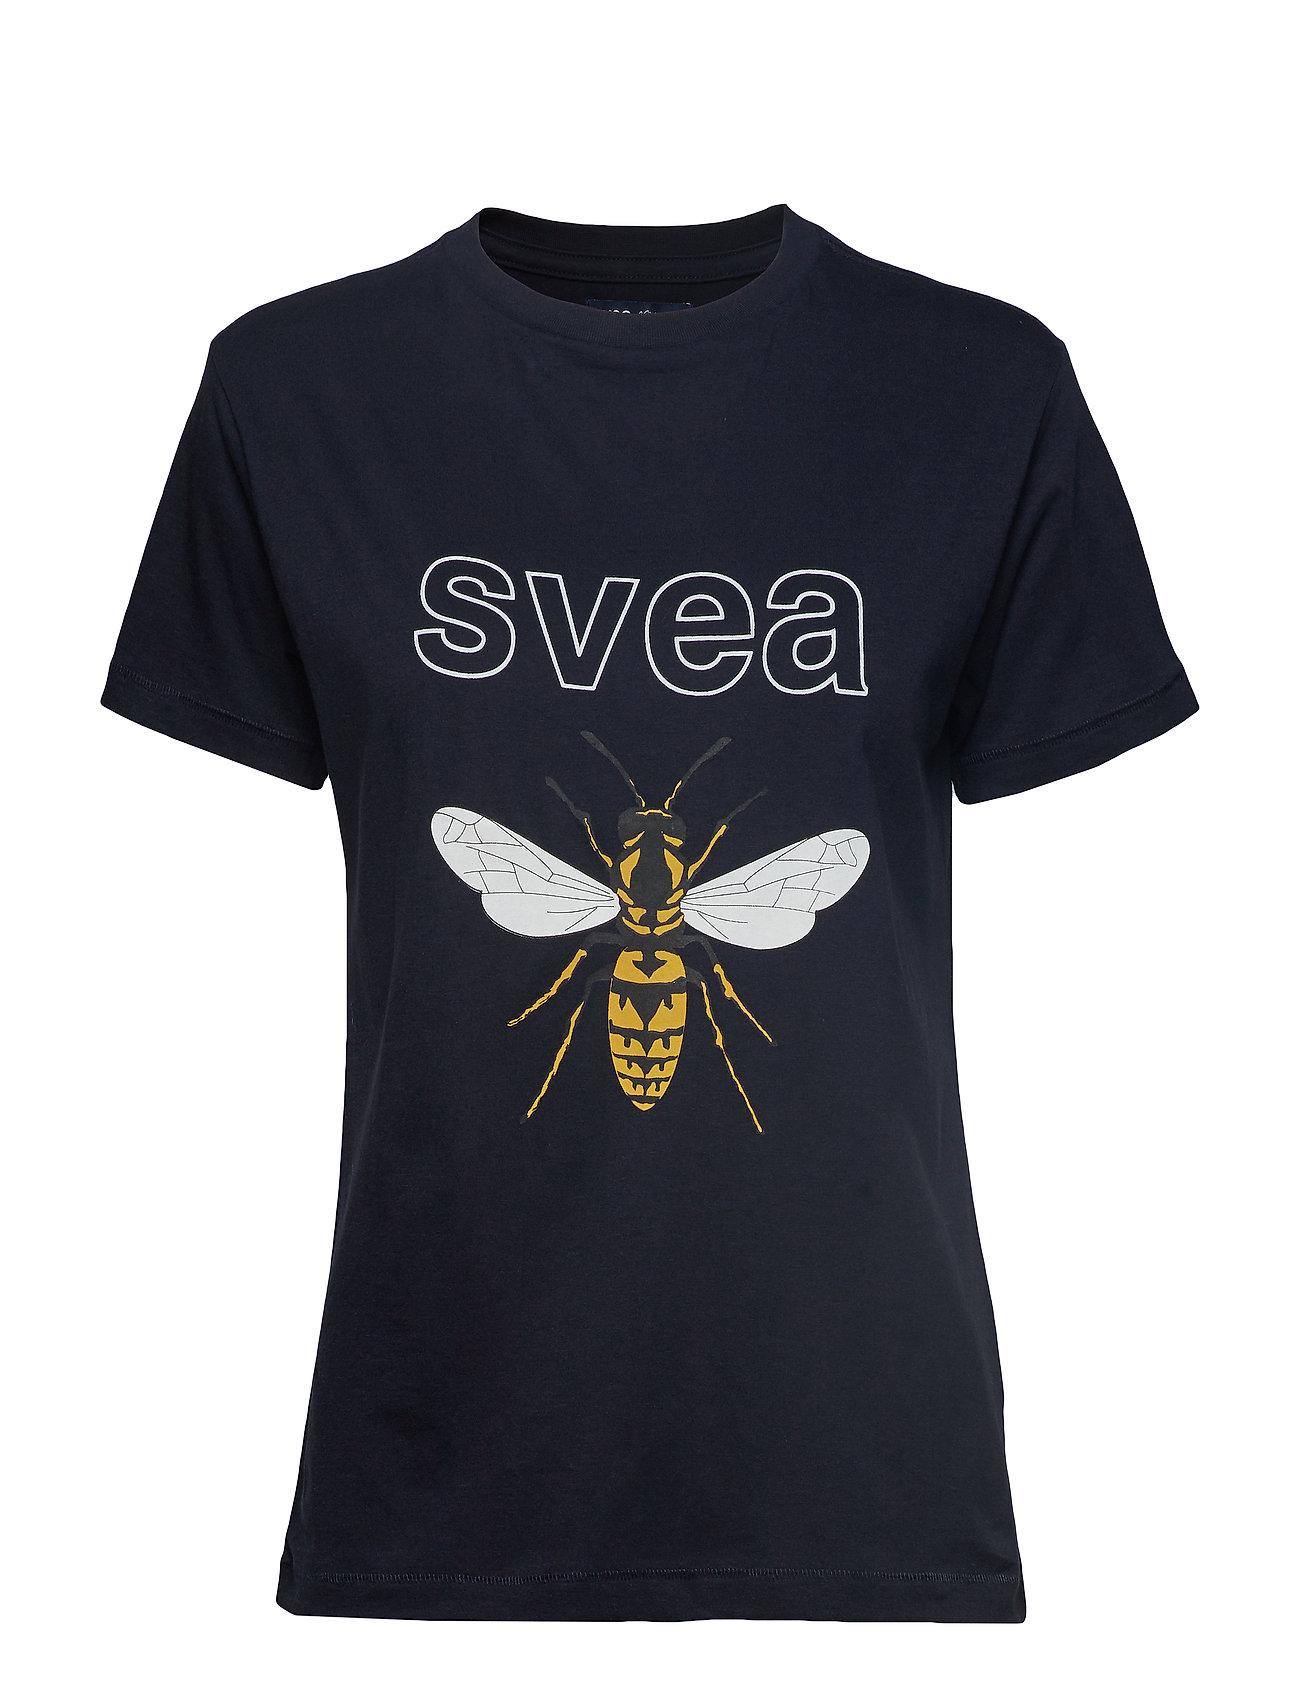 Svea Insect Tee - NAVY